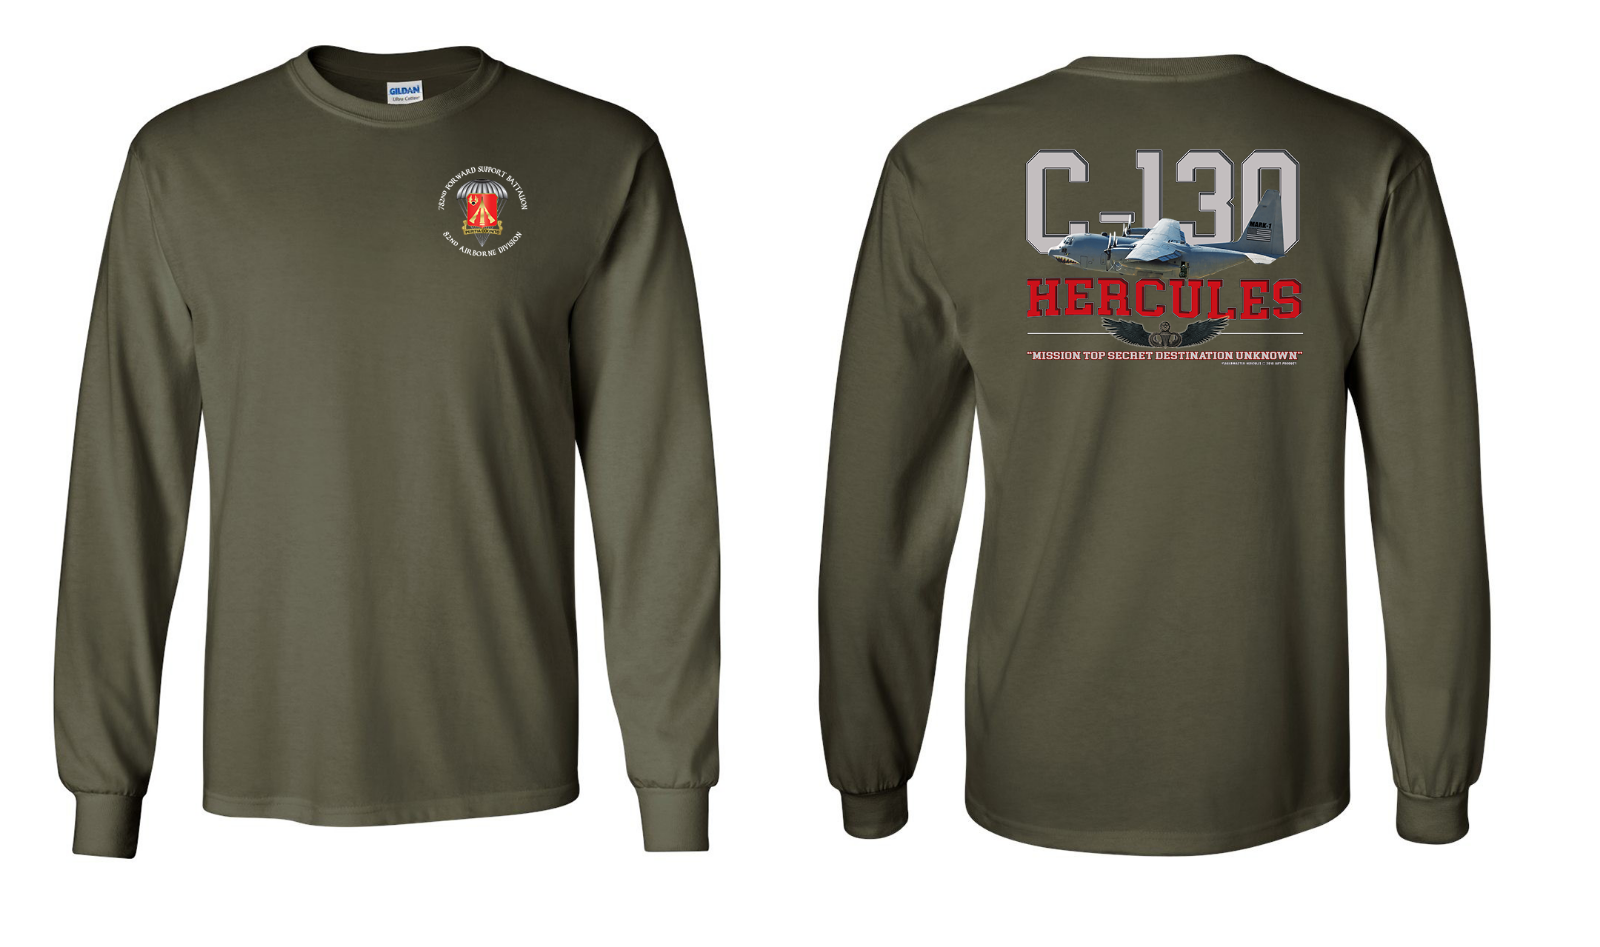 782nd batallón de mantenimiento C-130 Camisa Manga Larga De Algodón 8146 - 8146 Algodón 684437